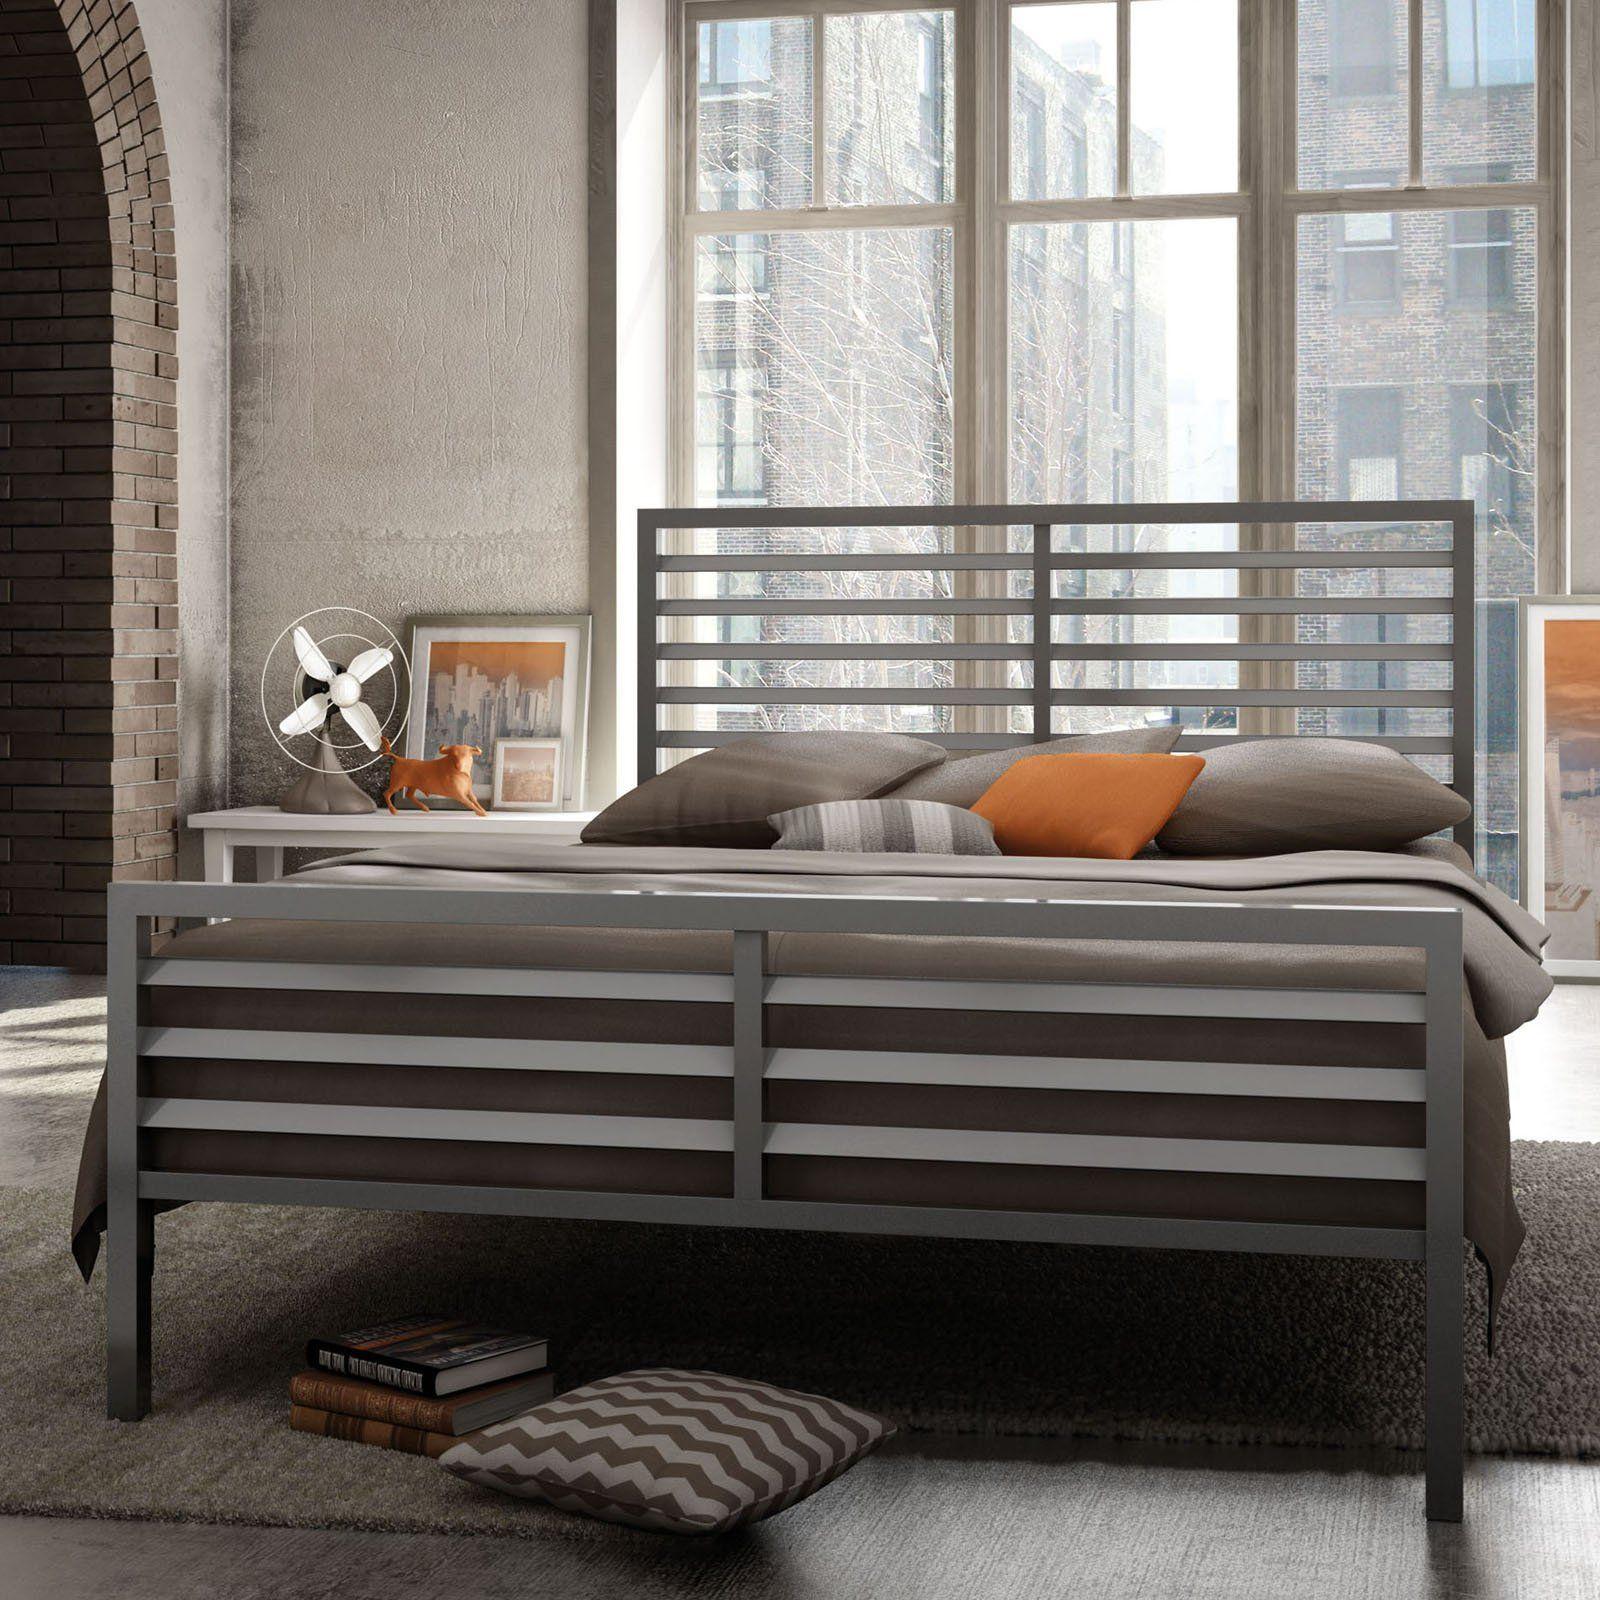 amisco bridge bed 12371 furniture bedroom urban. Amisco Theodore Metal Bed - Revolutionize Your Nightlife With The Bed. Best Bridge 12371 Furniture Bedroom Urban